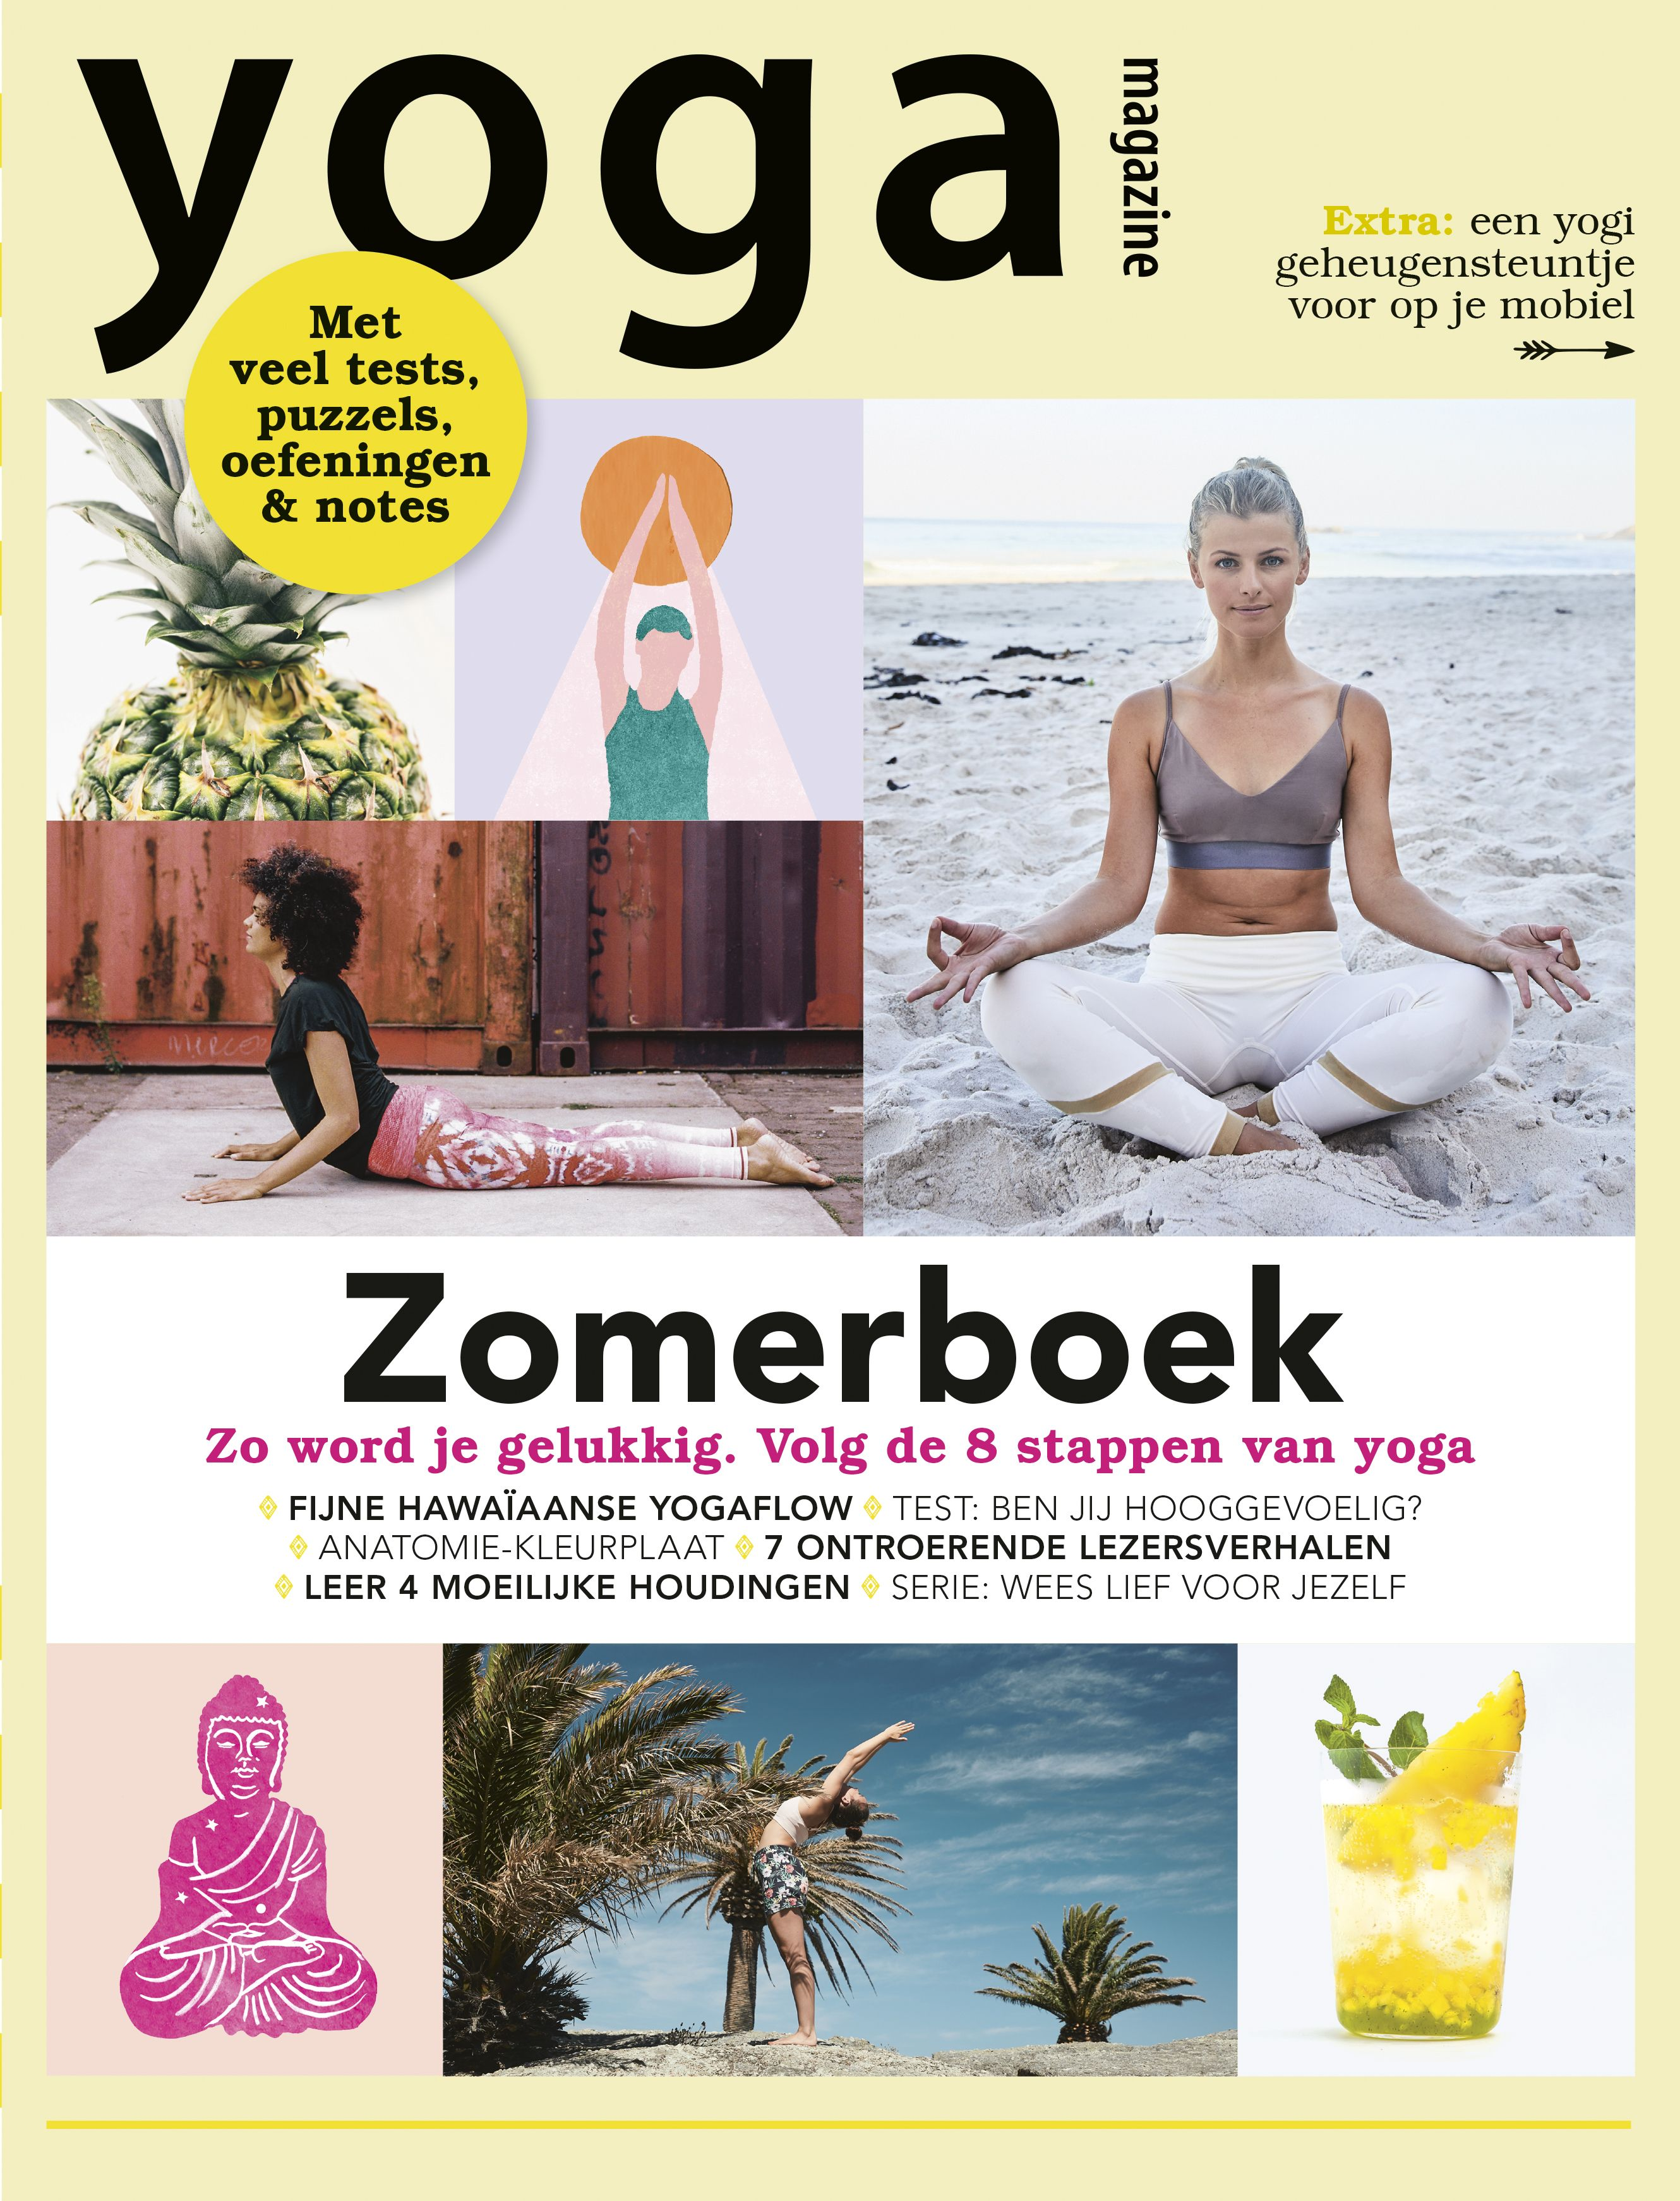 zomerboek, yoga magazine, sutra's, patanjali, achtvoudige pad, filosofie, yoga